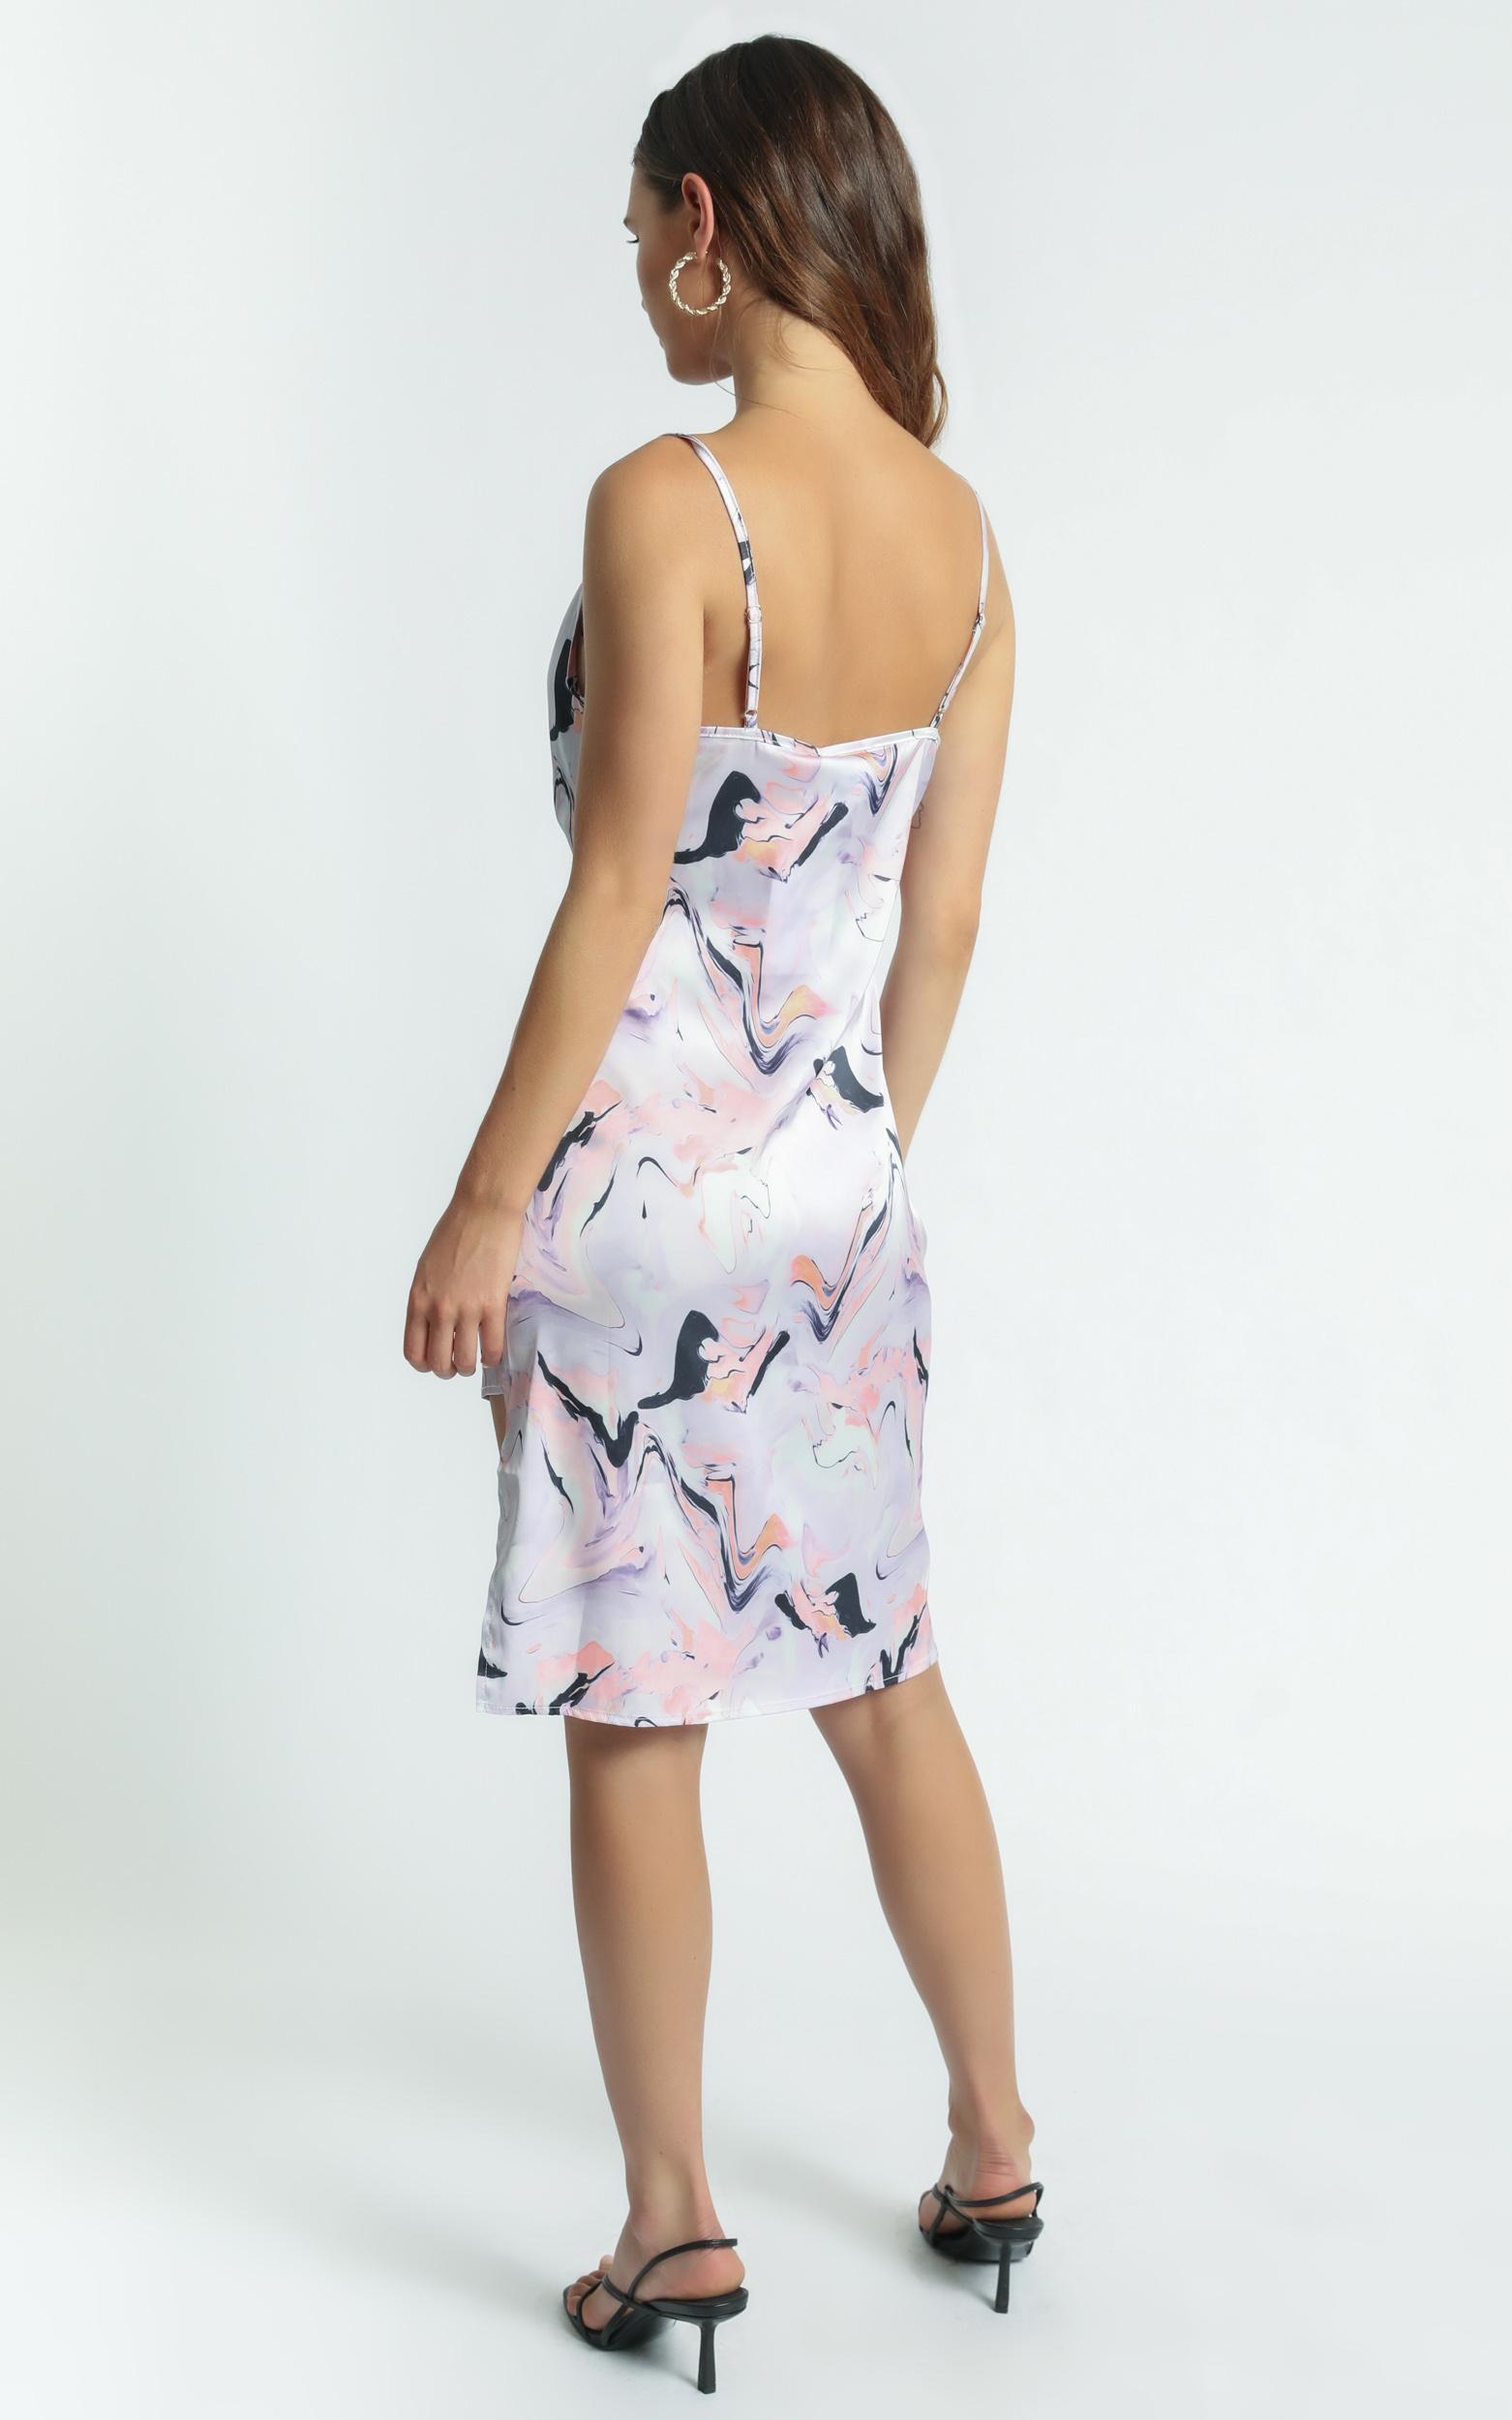 Twiin - Aphrodite Slip Dress in Multi - XS, Multi, hi-res image number null